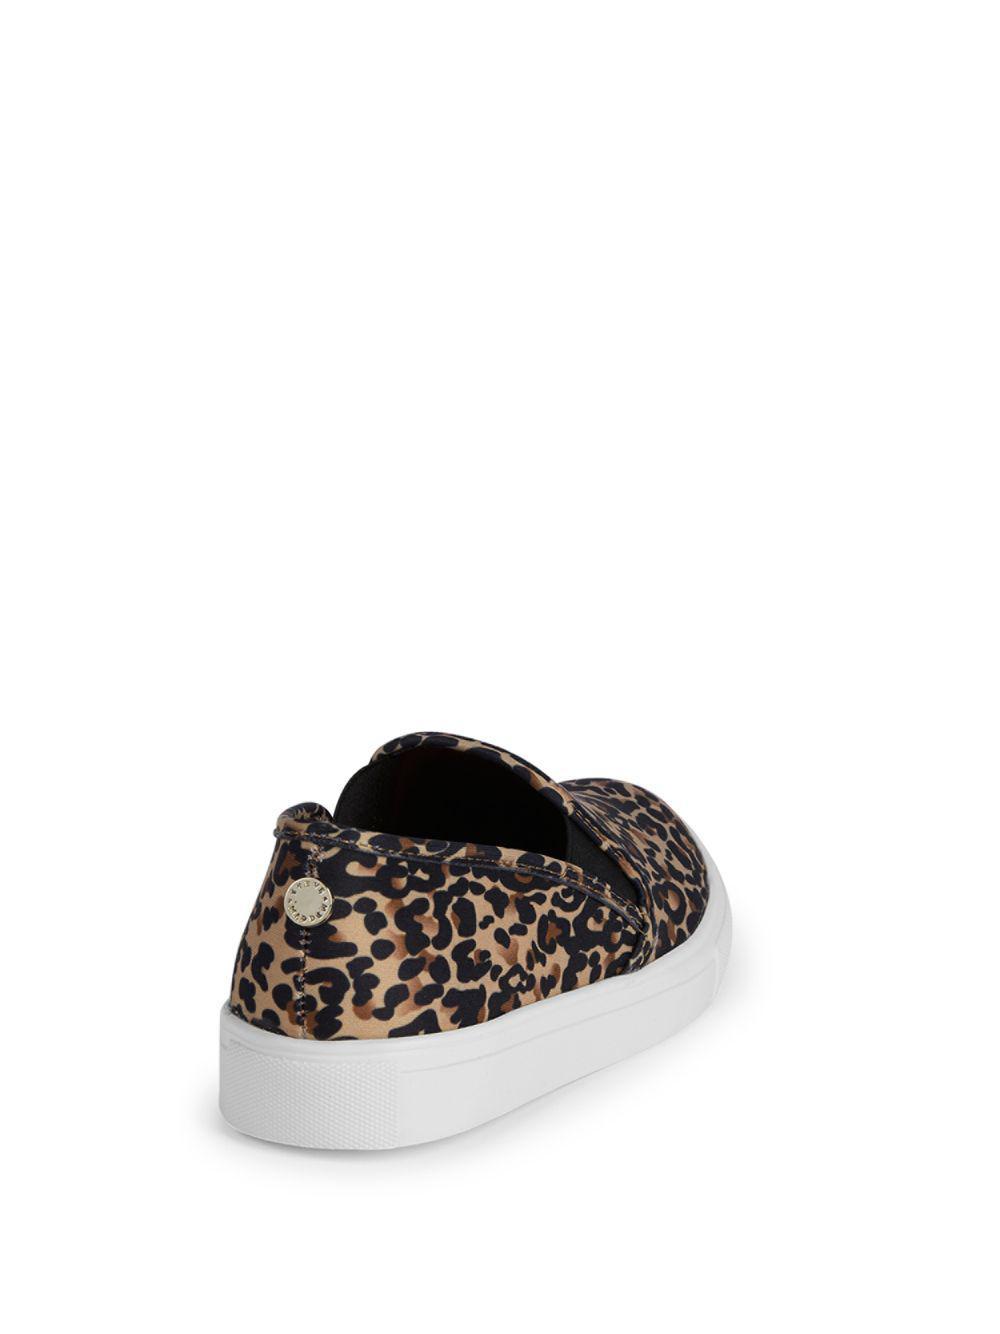 f4221225027 Lyst - Steve Madden Leopard-print Platform Sneakers in Brown